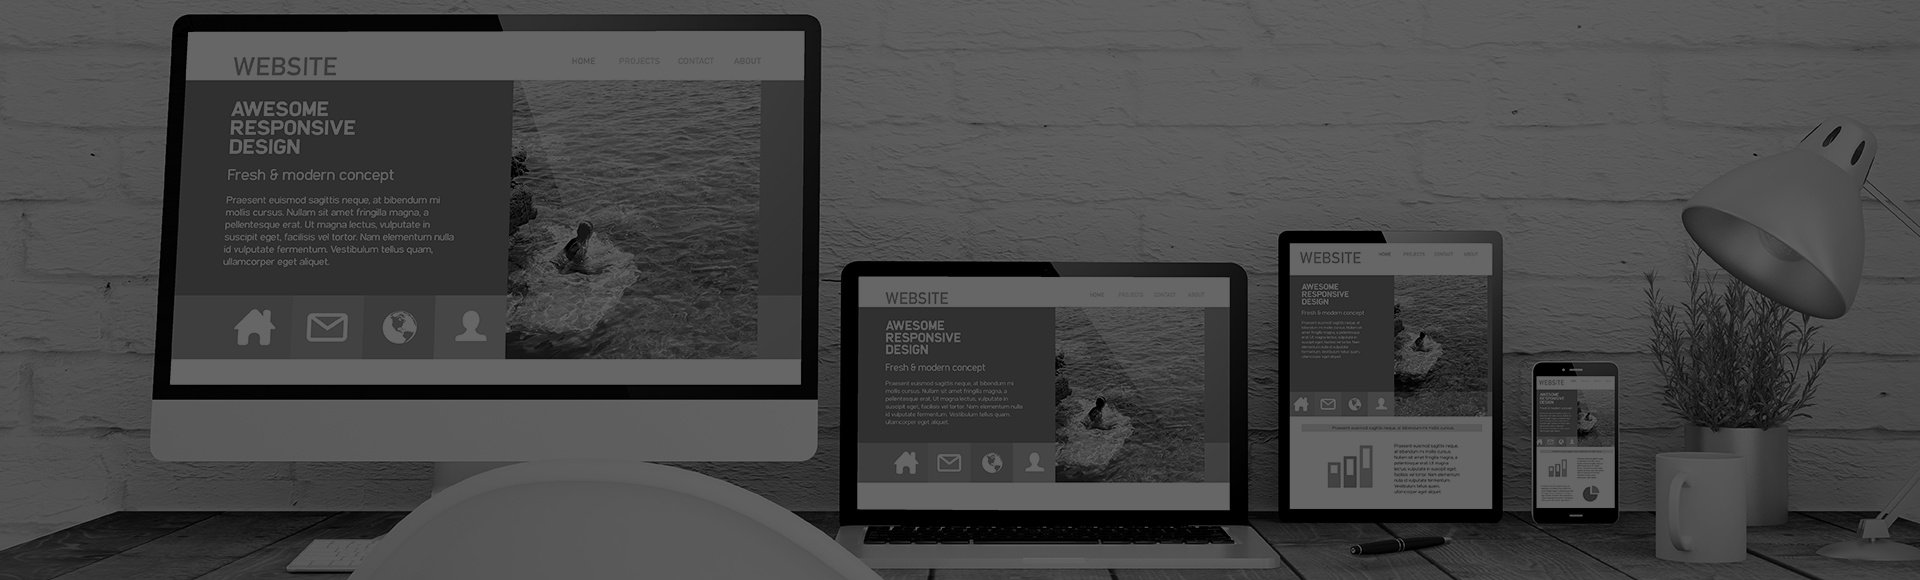 Website Design & Development Services, Nexa, Dubai